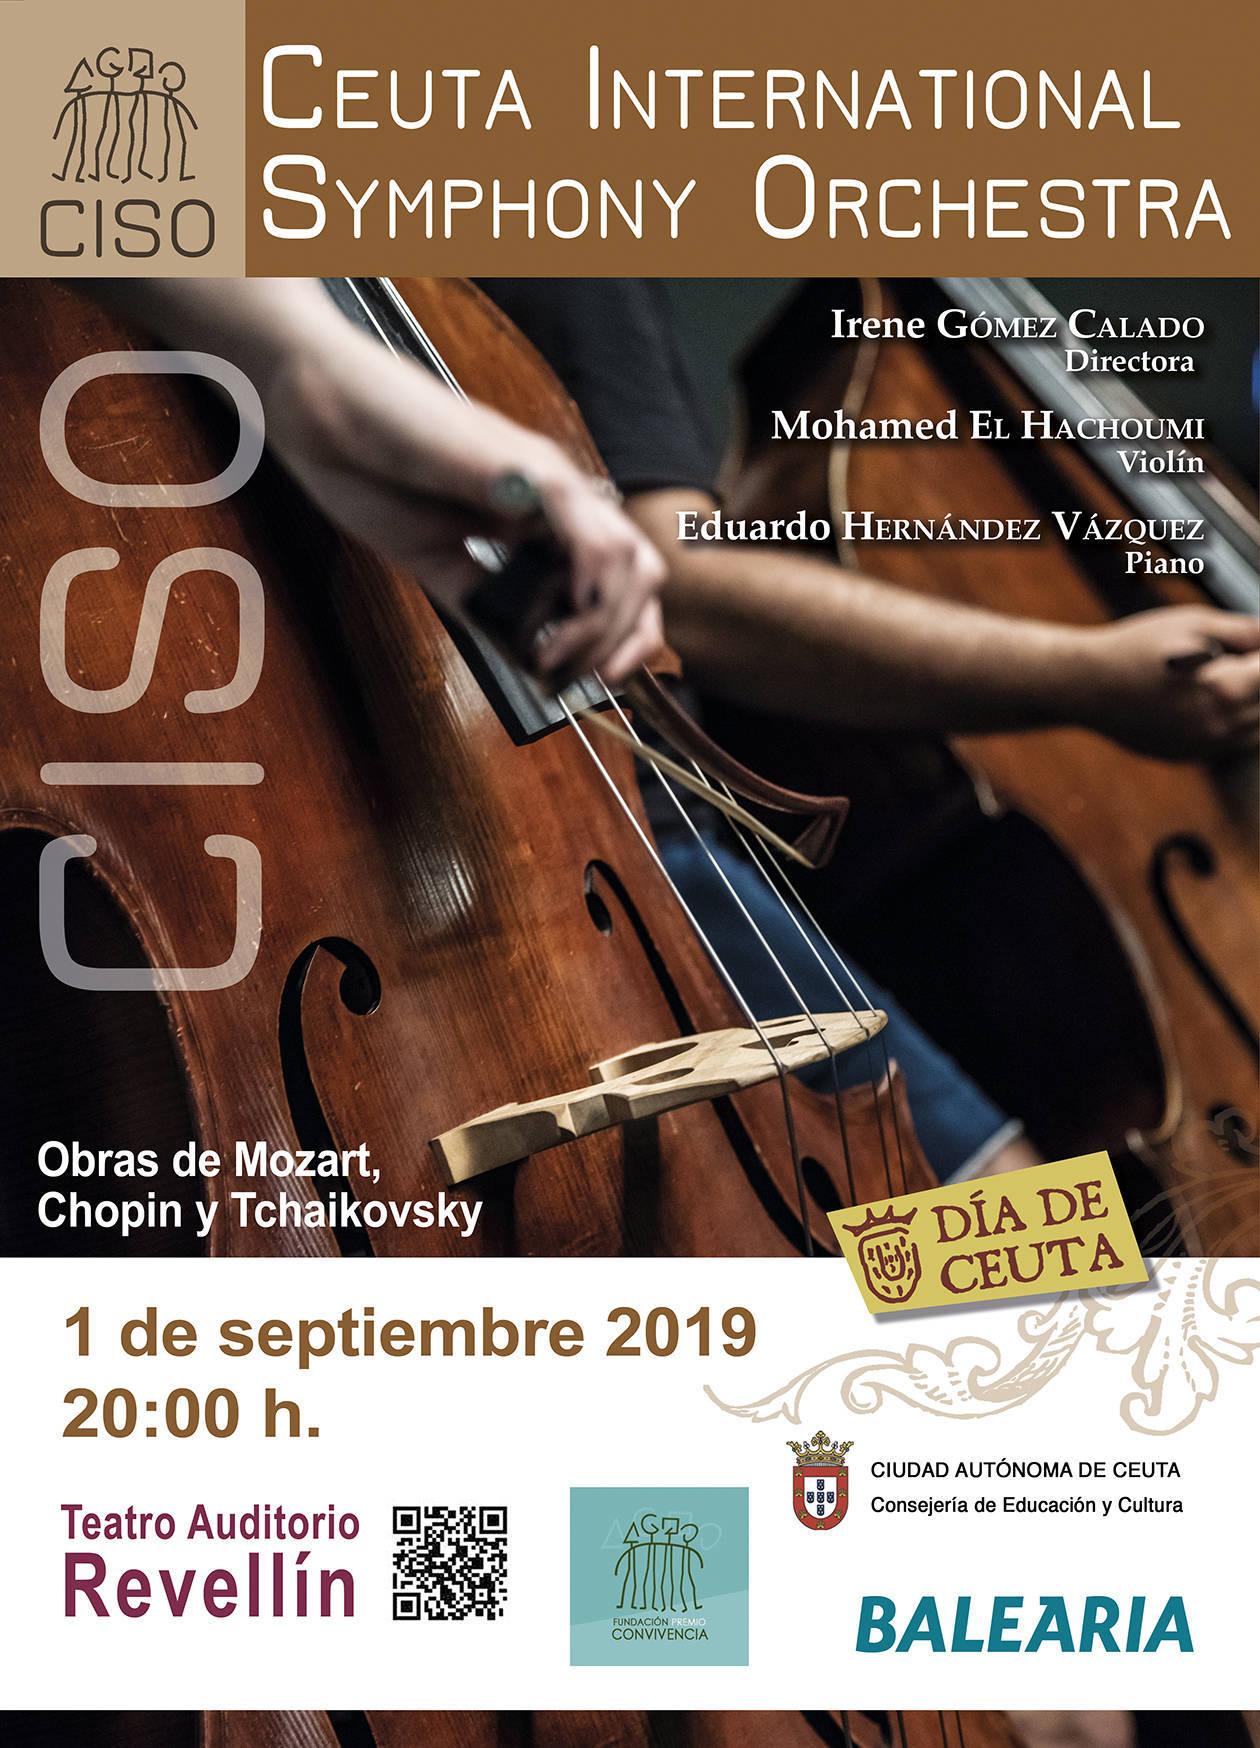 Ceuta International Symphony Orchestra 2019